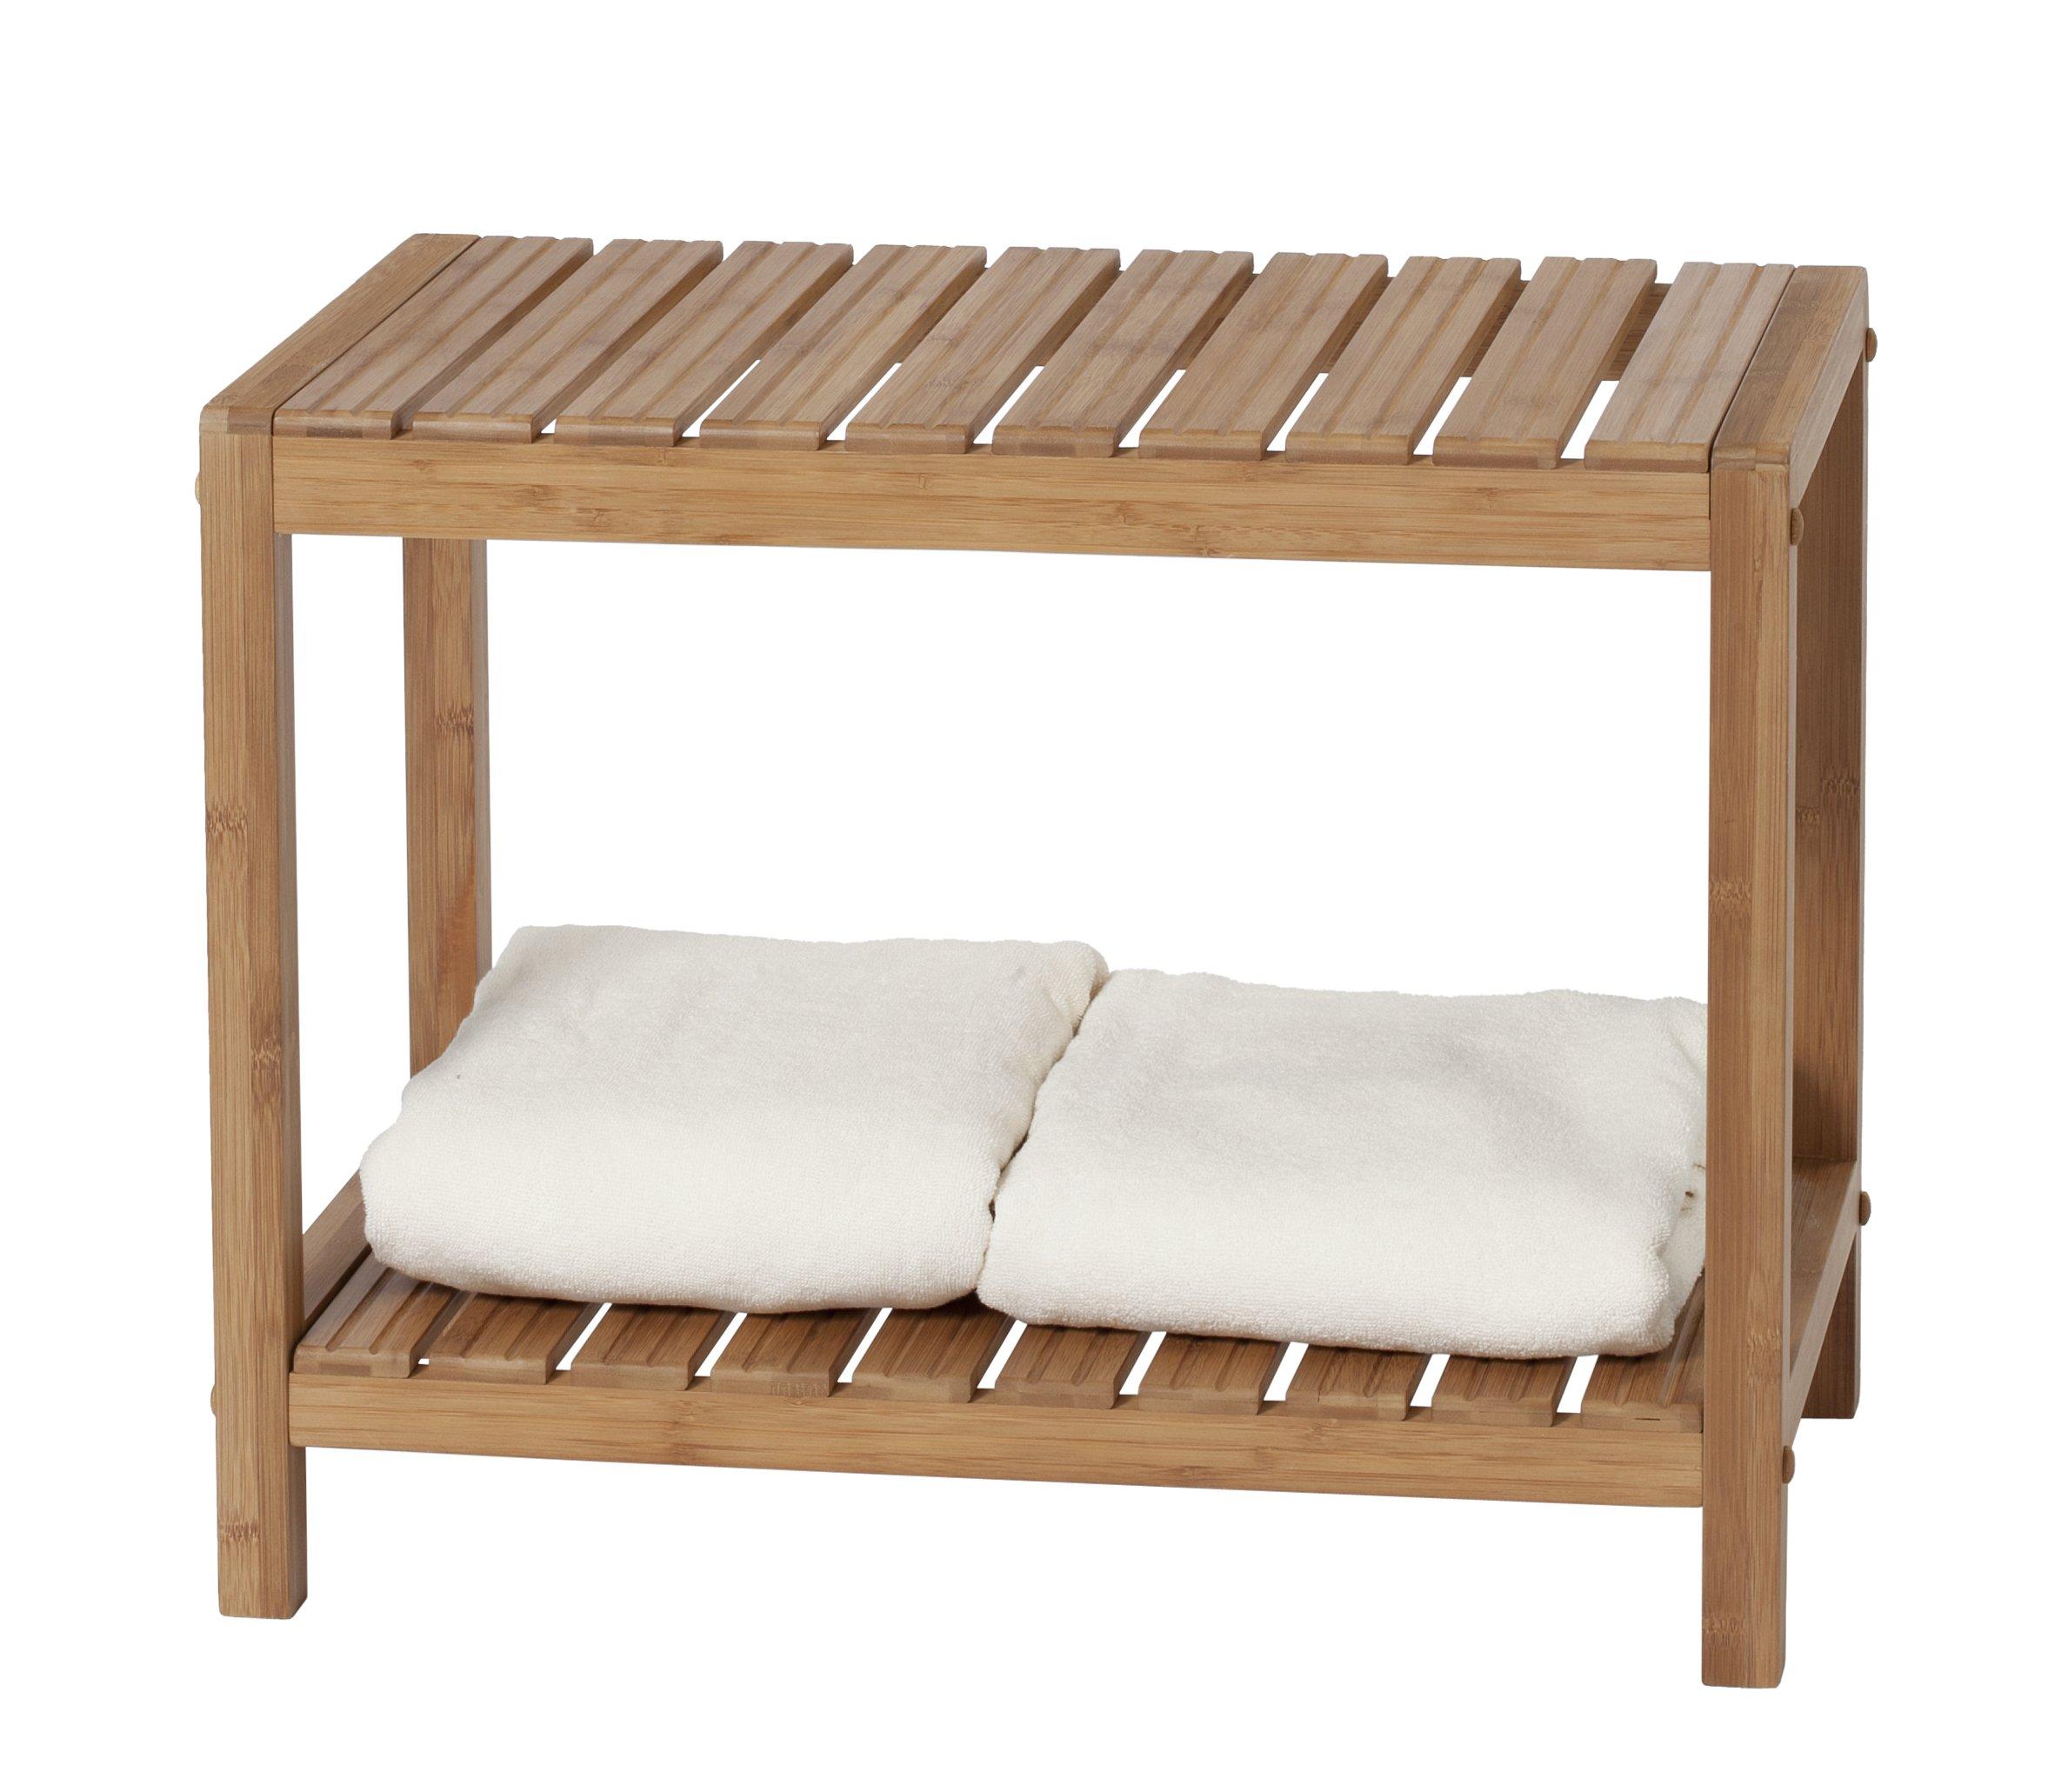 CreativeWare Eco Styles Spa Bench